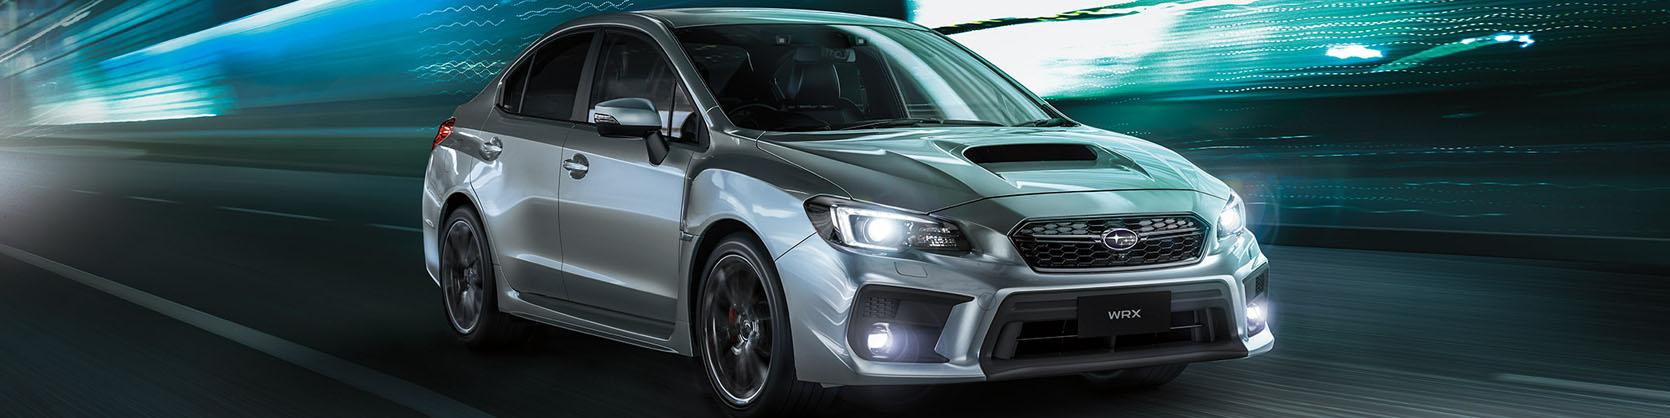 New Subaru WRX STI for sale in Sunshine Coast - Cricks Subaru